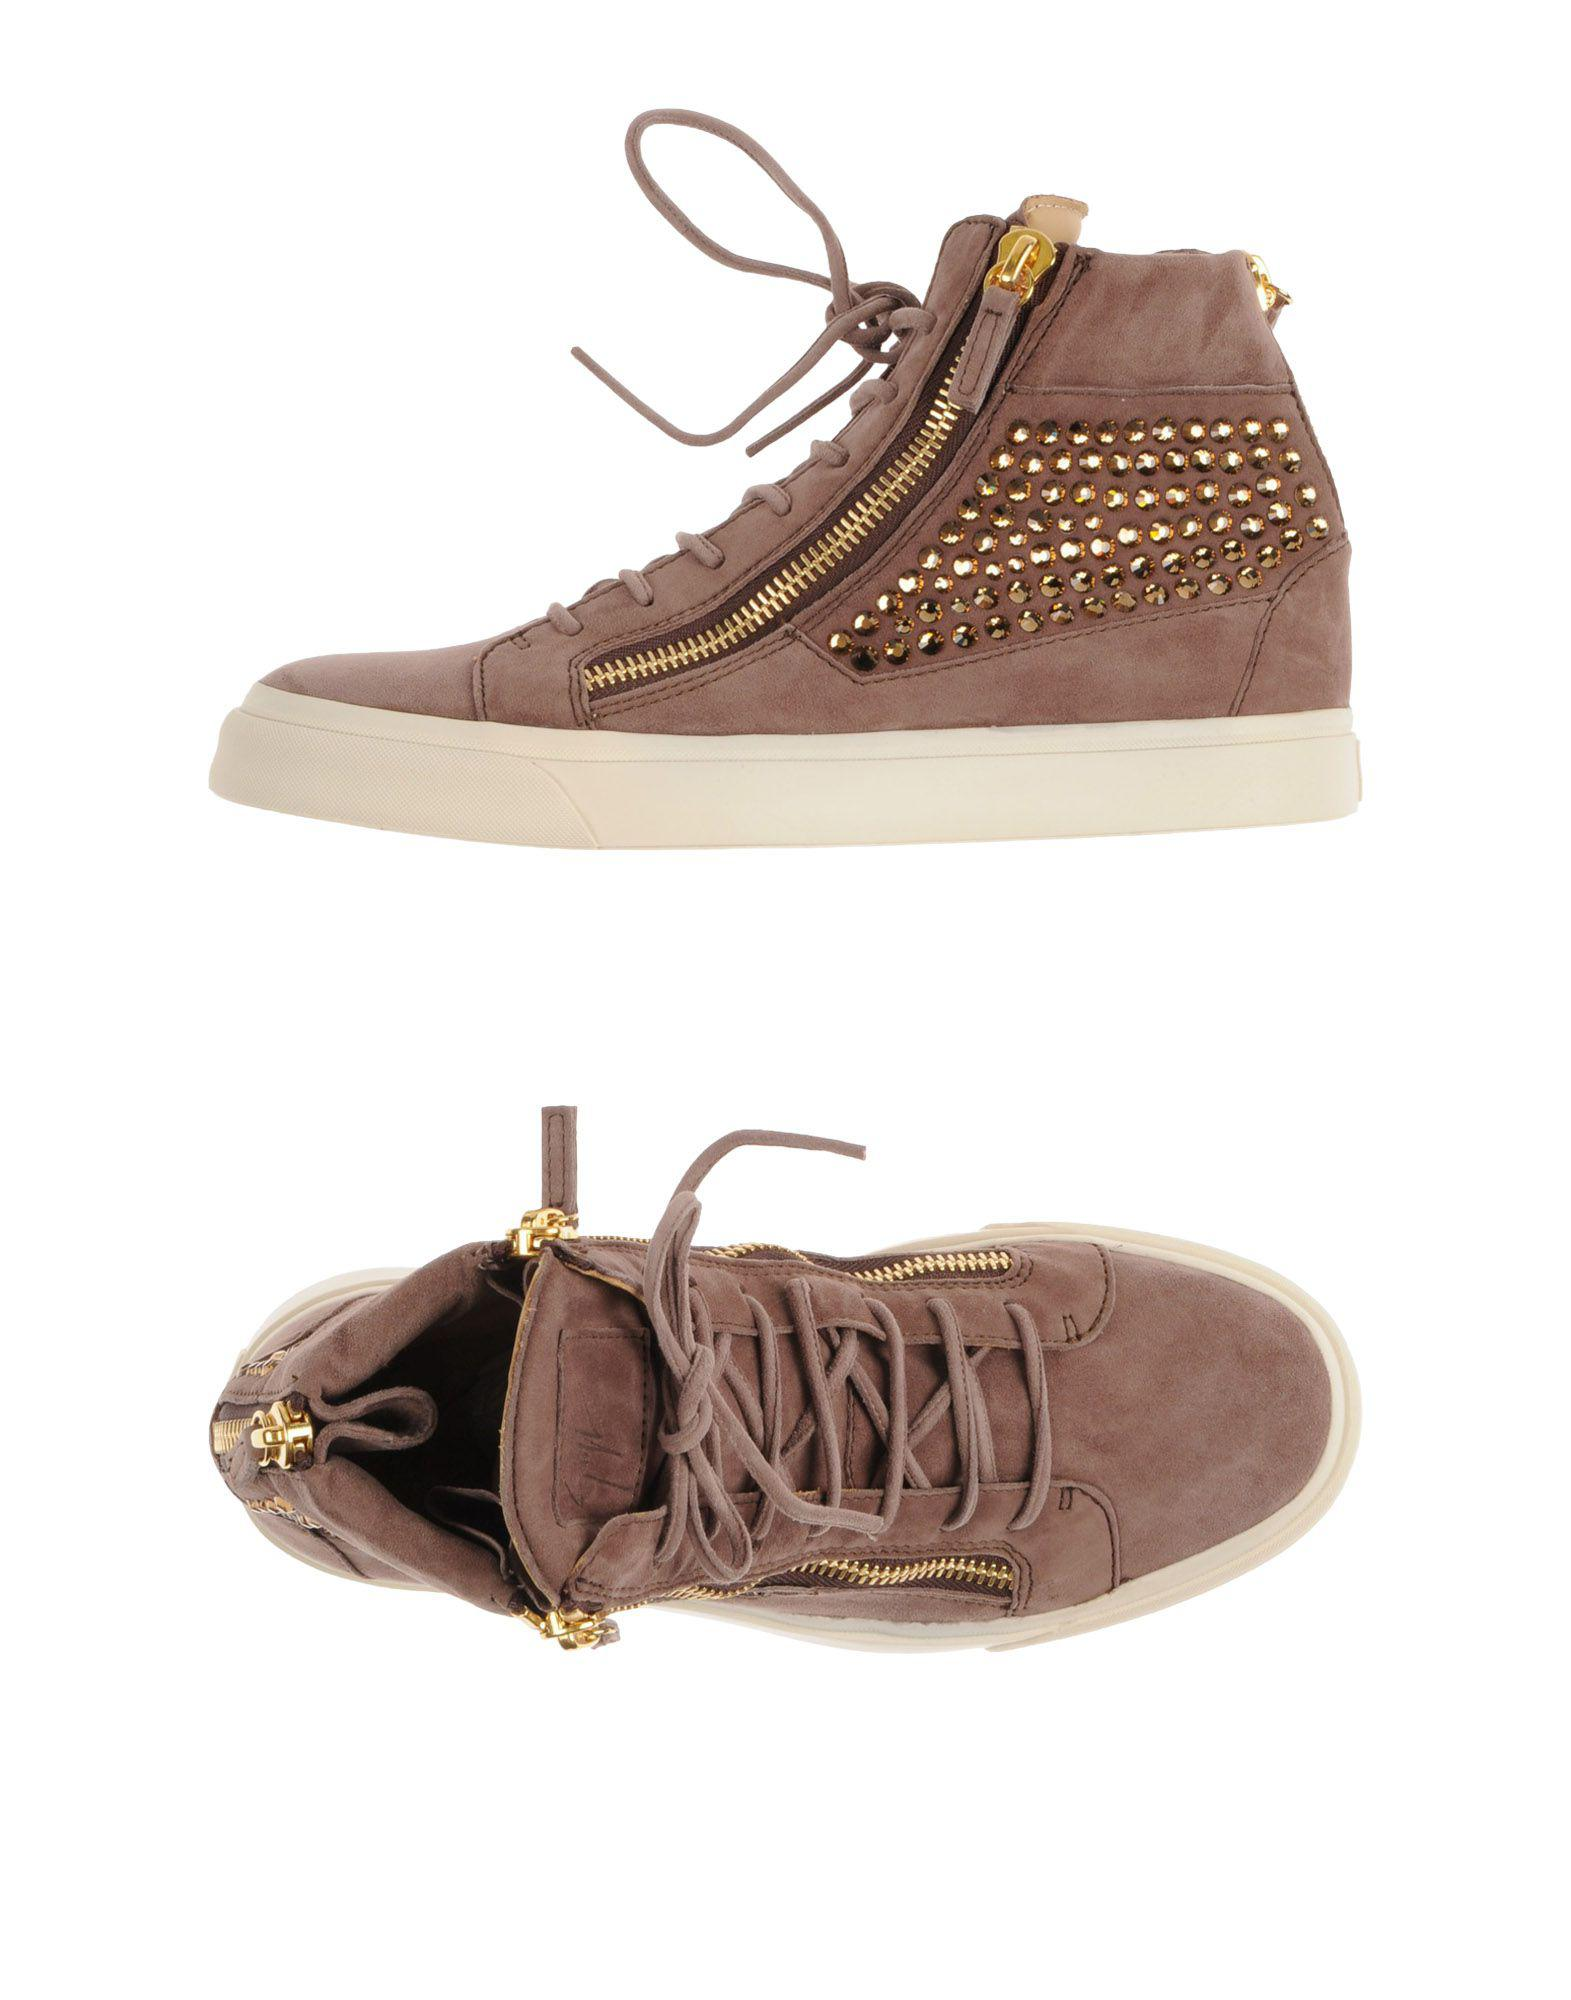 71dae2103bf Lyst - Giuseppe Zanotti High-tops   Sneakers in Brown for Men